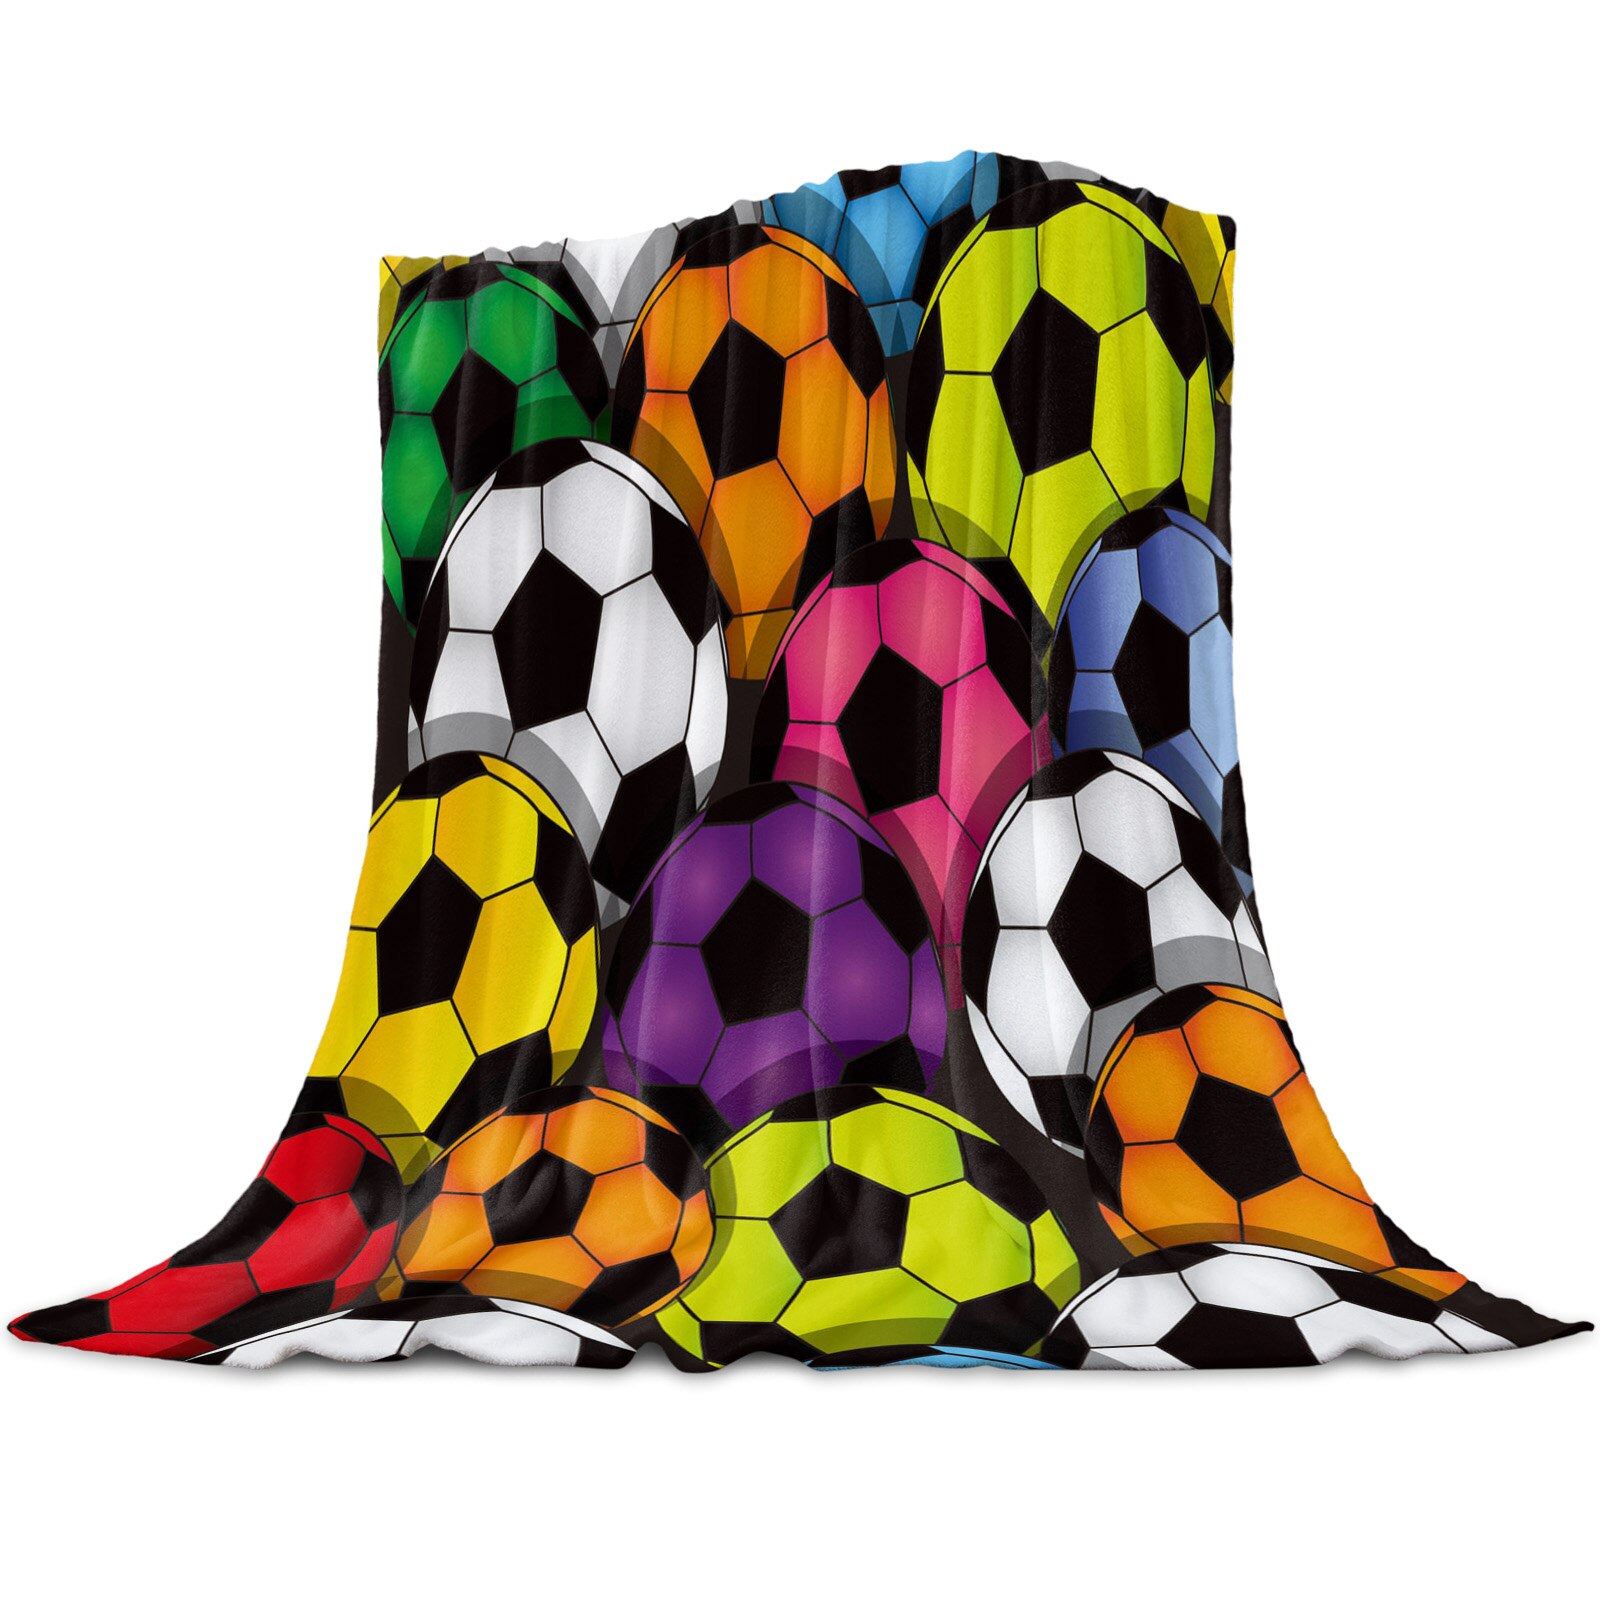 Soccmaker كرة القدم الملونة المرجان الصوف بطانية الشتاء ورقة المفرش أريكة سرير رمي خفيفة رقيقة لينة الدافئة الفانيلا البطانيات